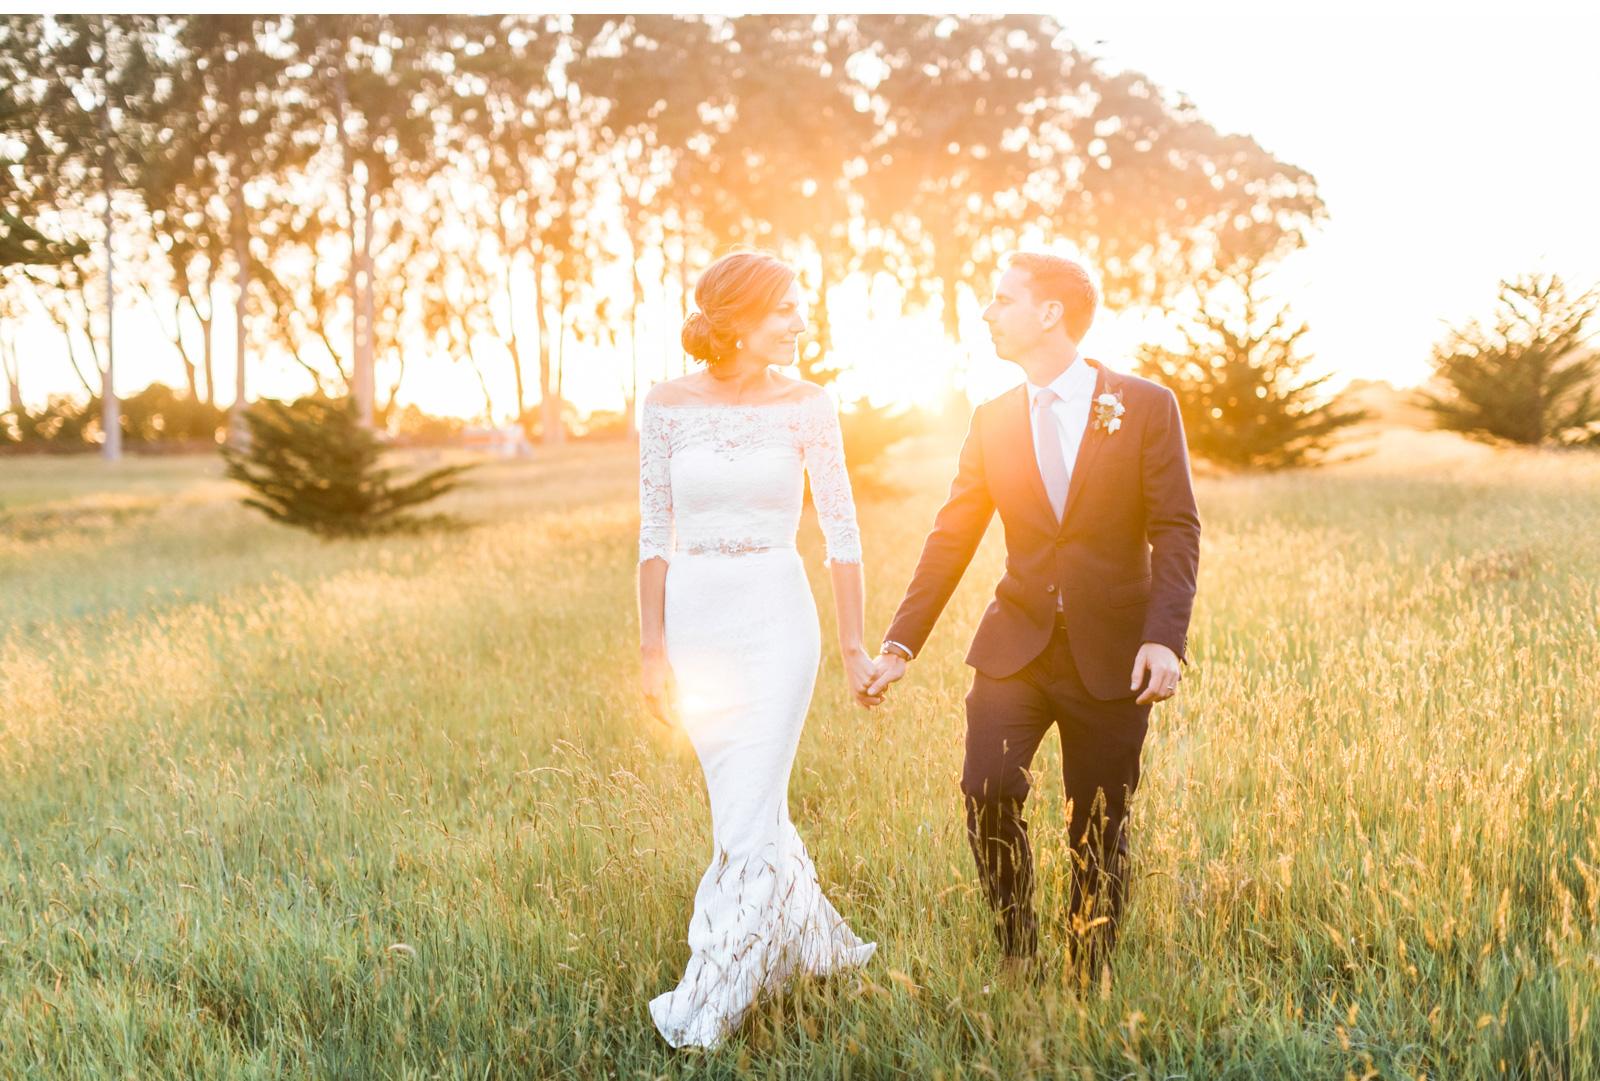 Natalie-Schutt-Photography-Adventure-Wedding-Mendocino_05.jpg